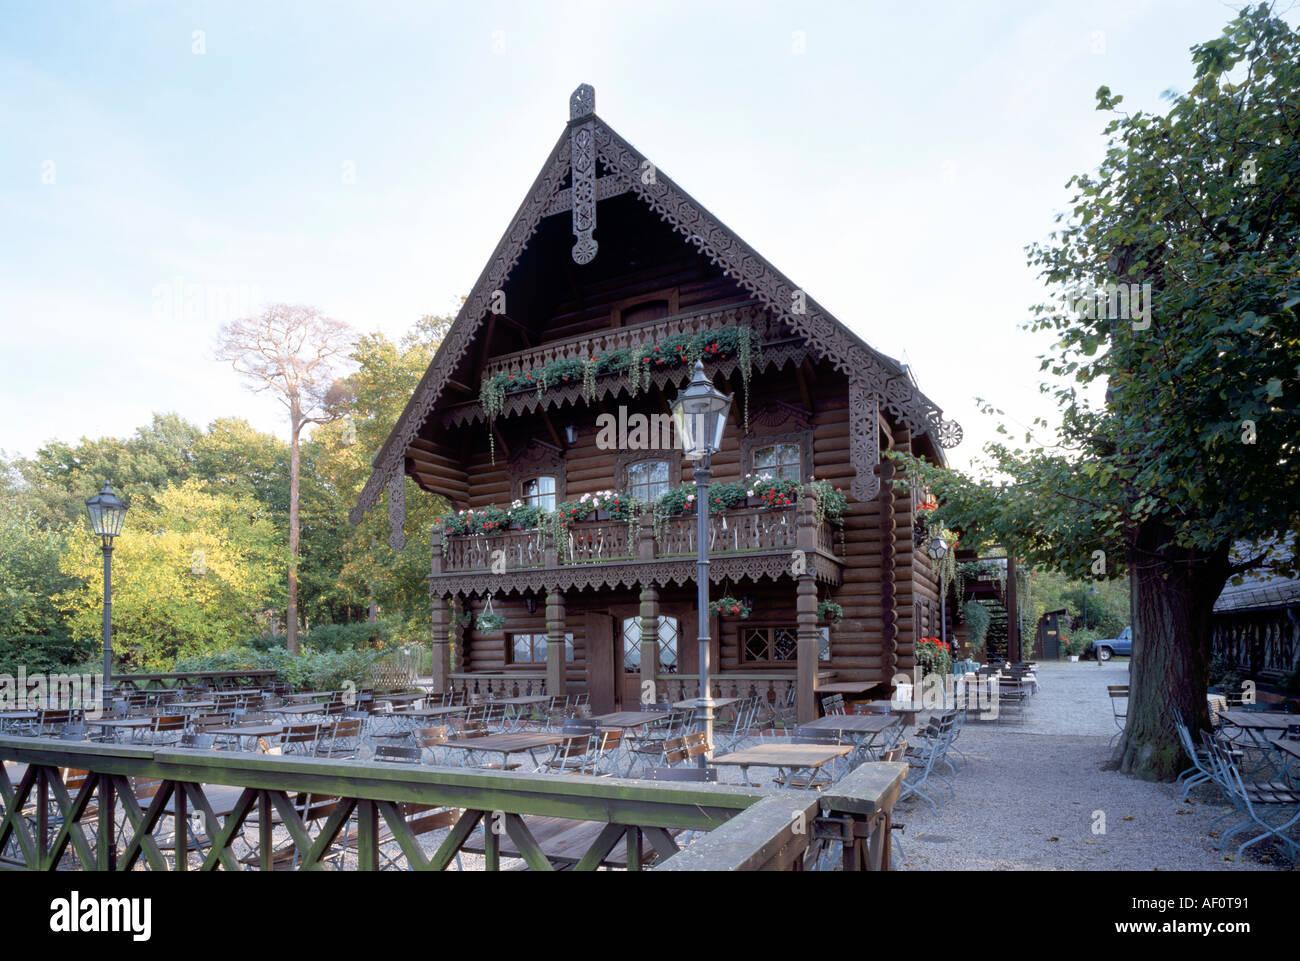 Berlin blockhaus nikolskoje wannsee terrassenseite stock image